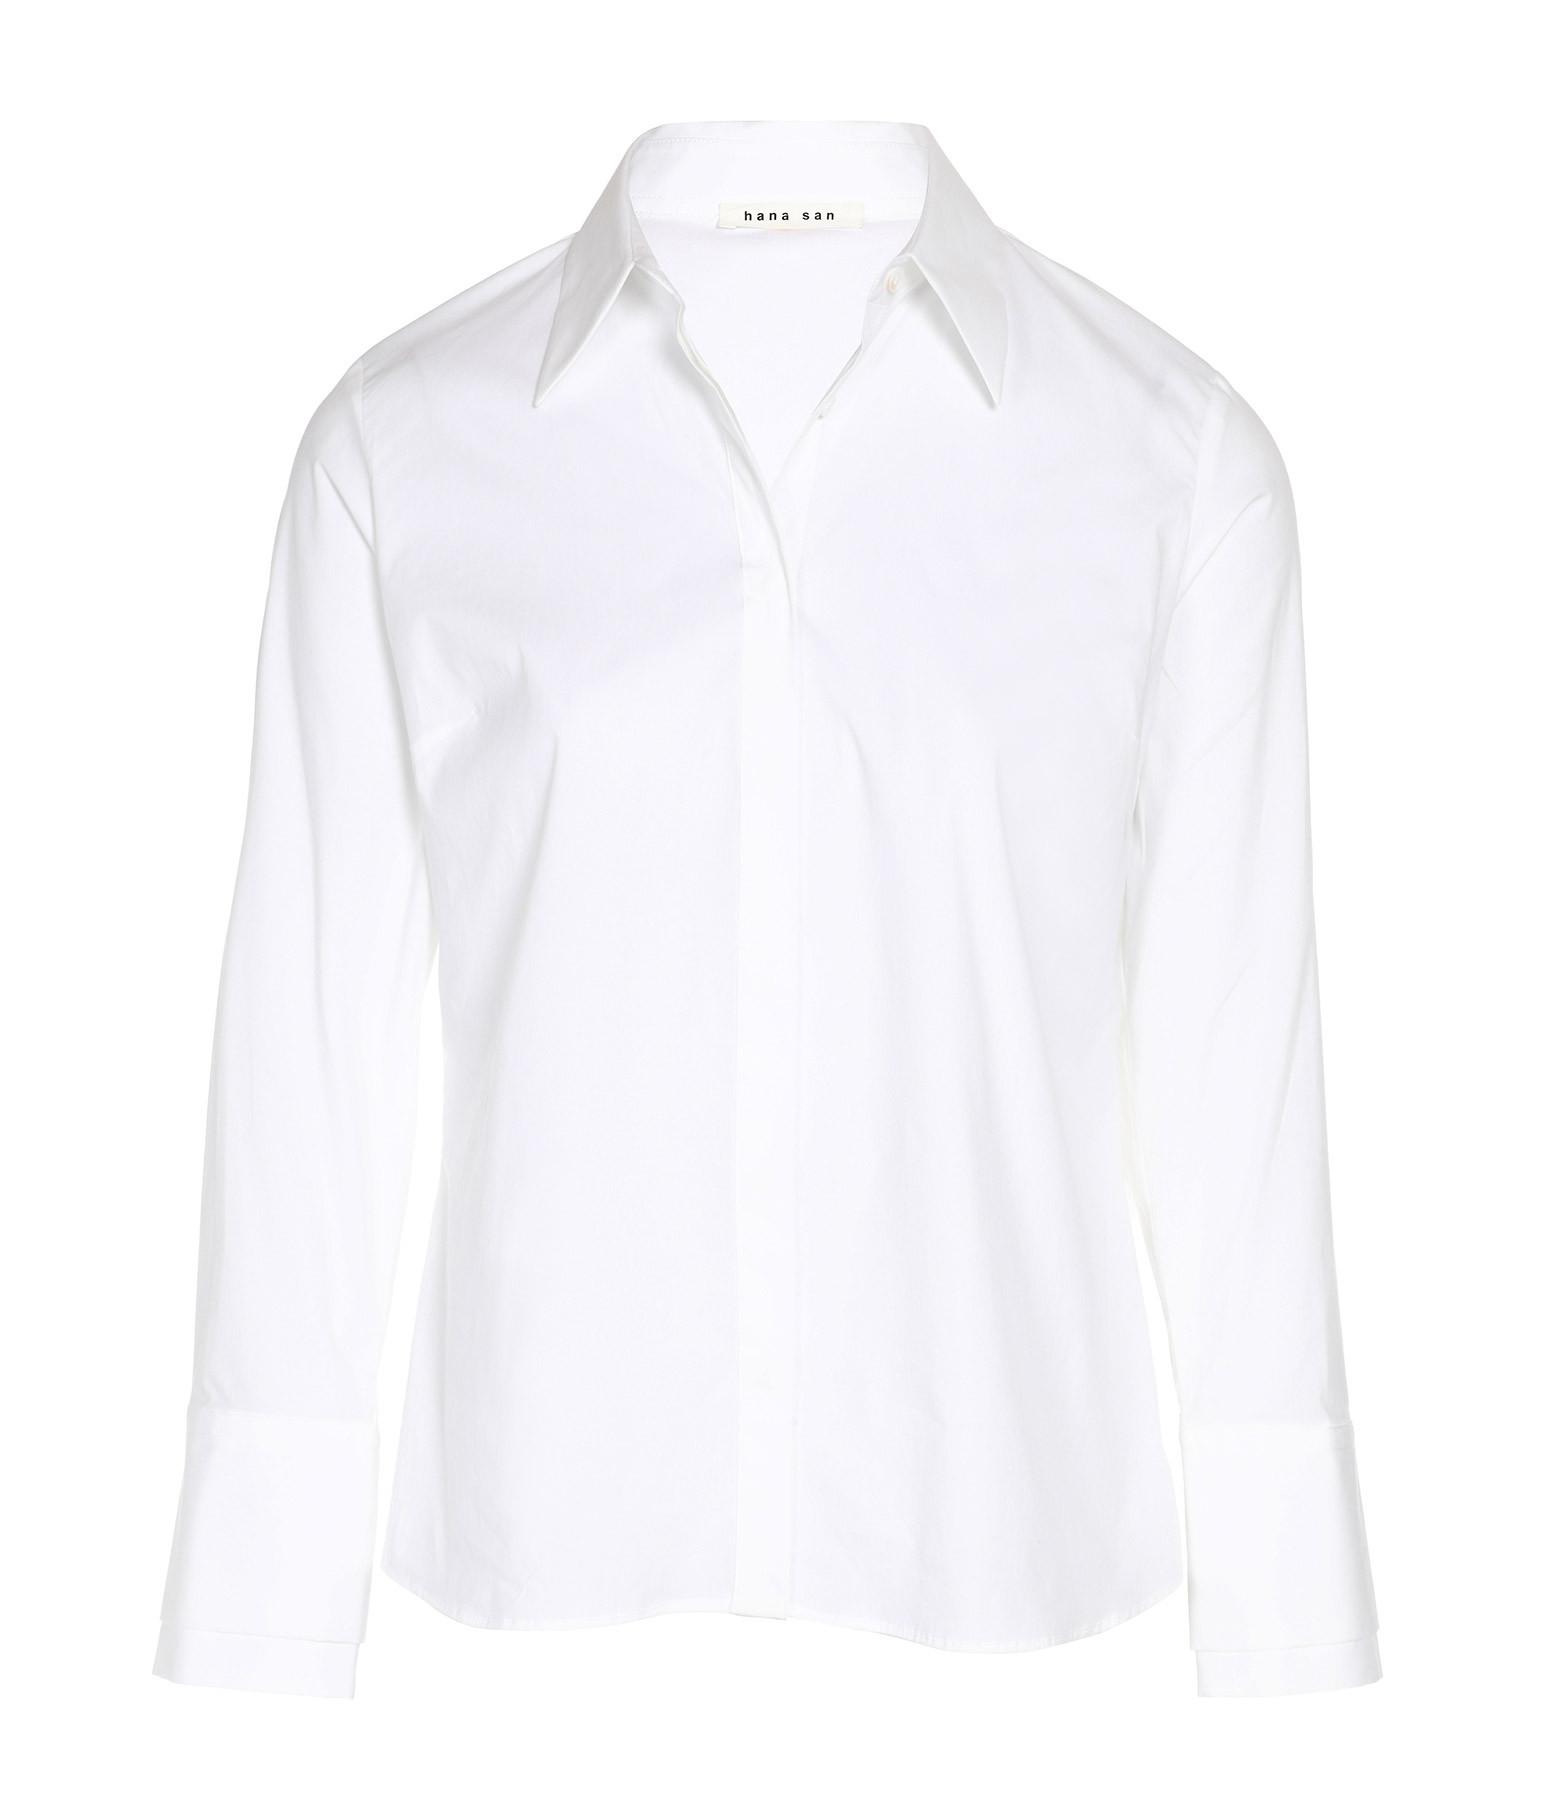 HANA SAN - Chemise Lila Coton Blanc